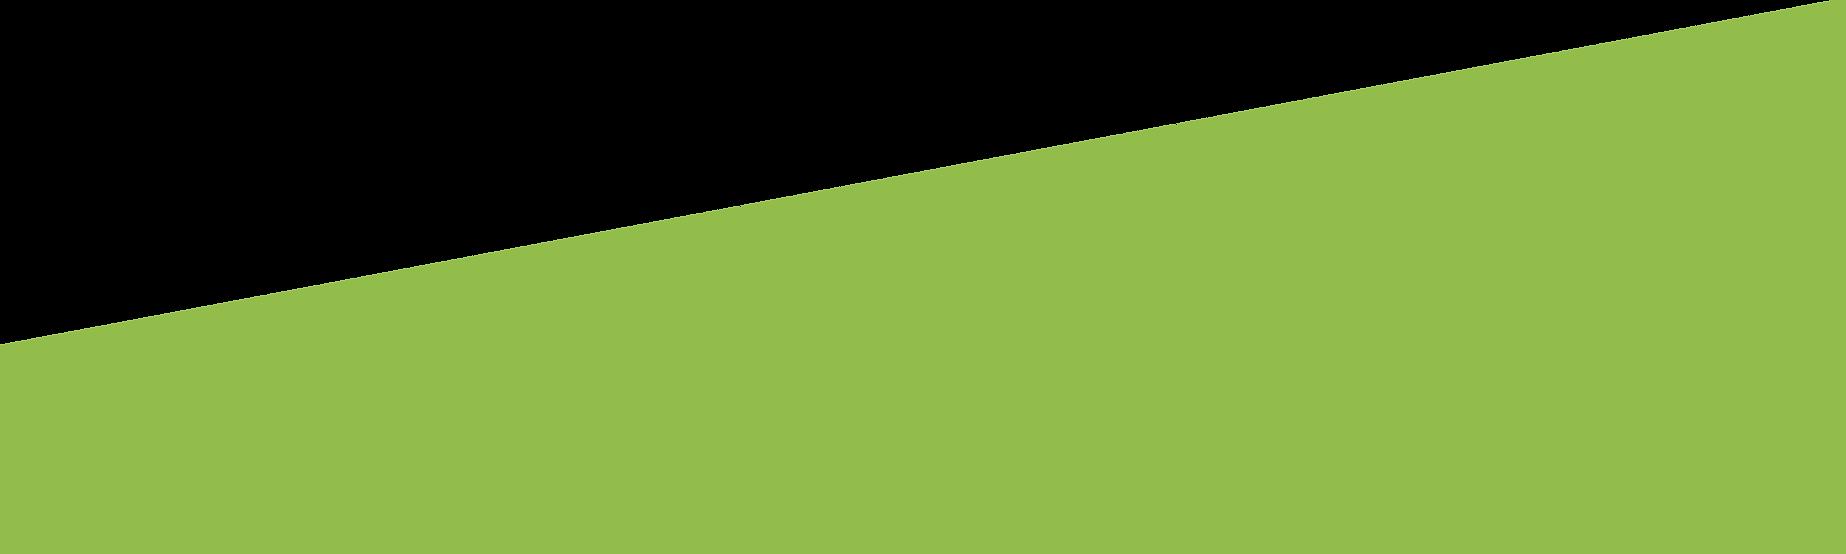 greenstrip.png